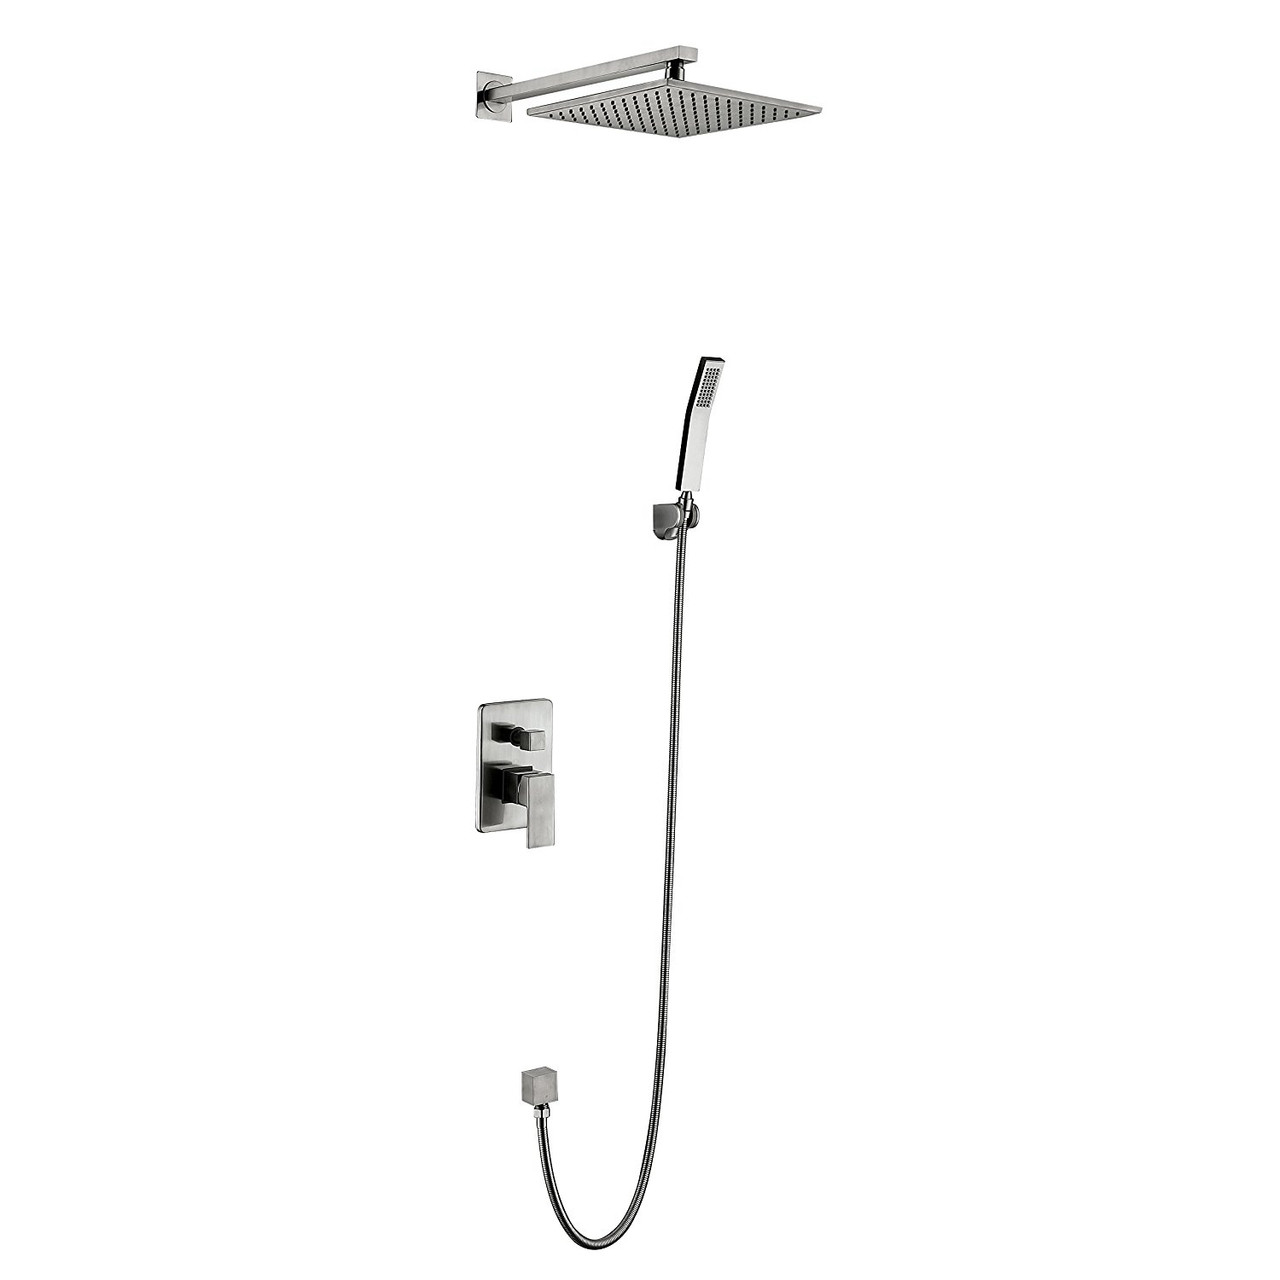 Royal Tampa 2 Way Shower System With Handheld Brushed Nickel Finish